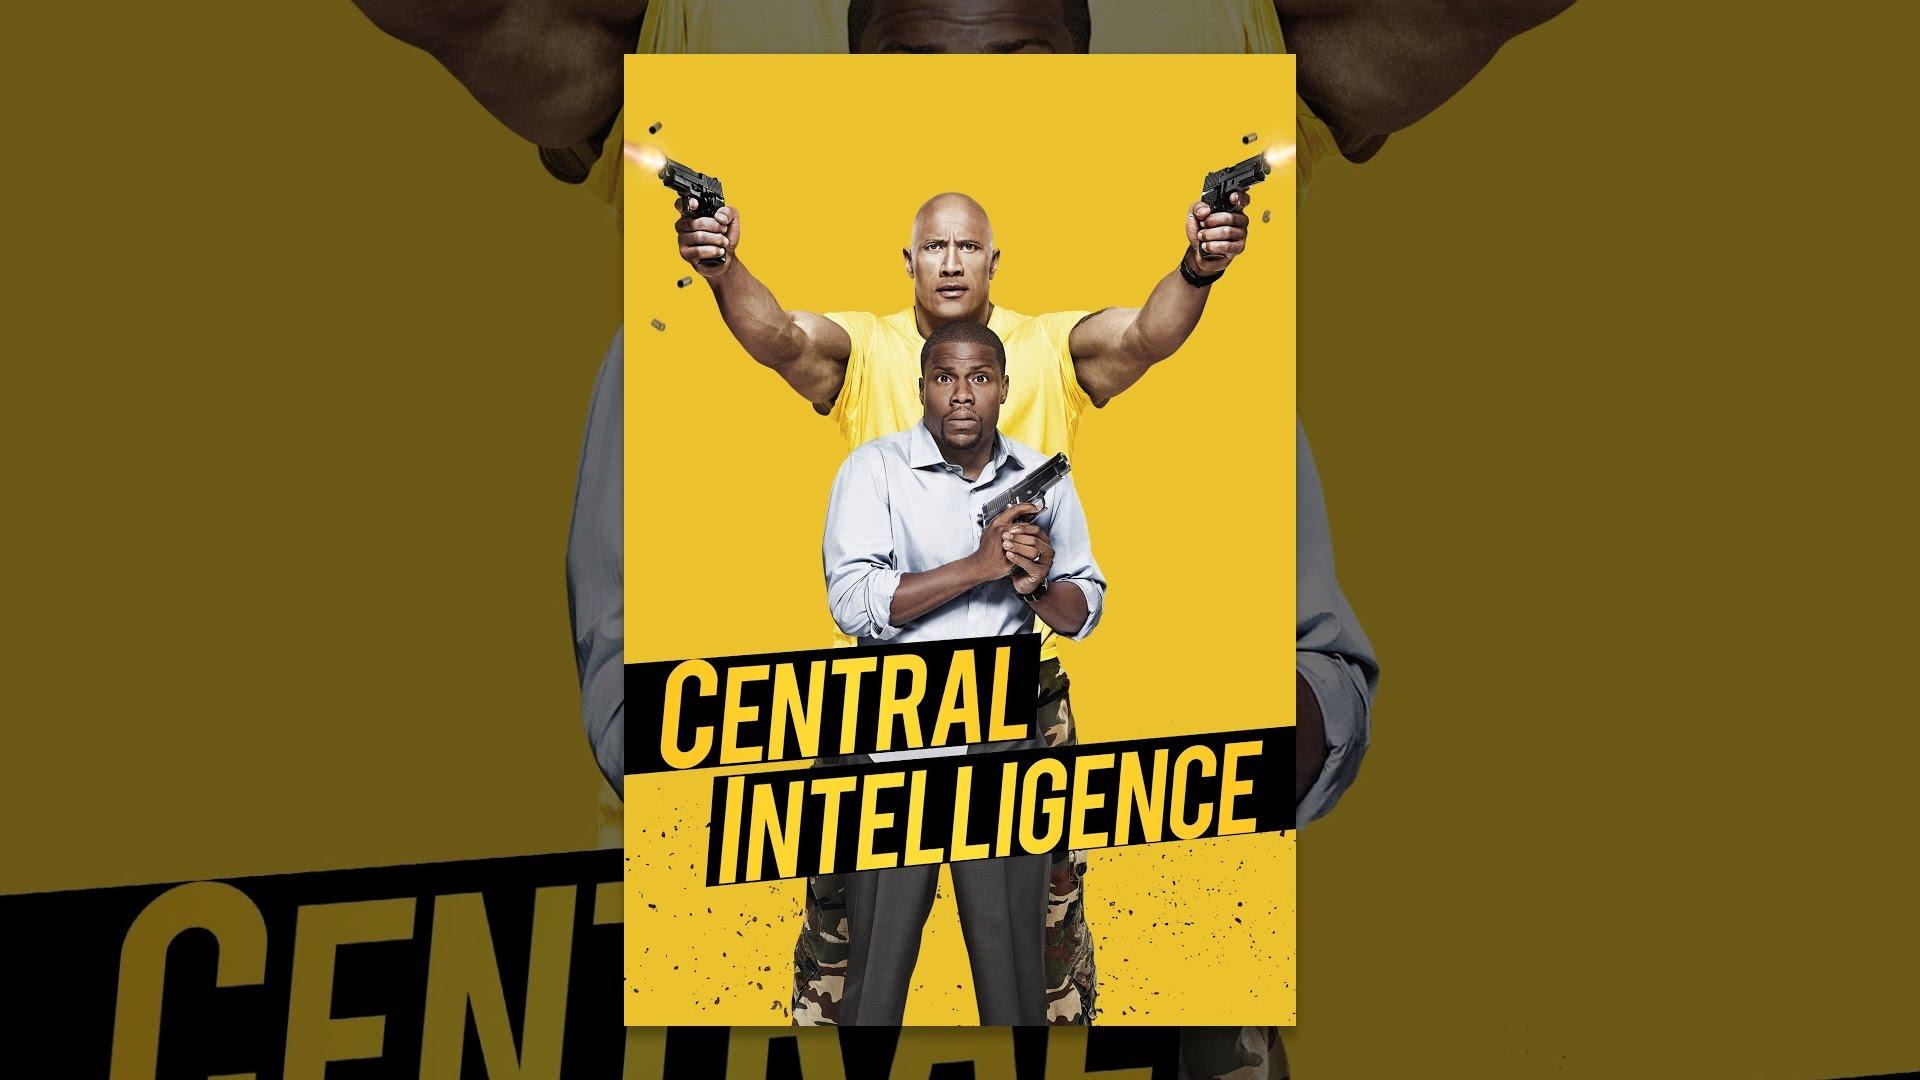 Download Central Intelligence